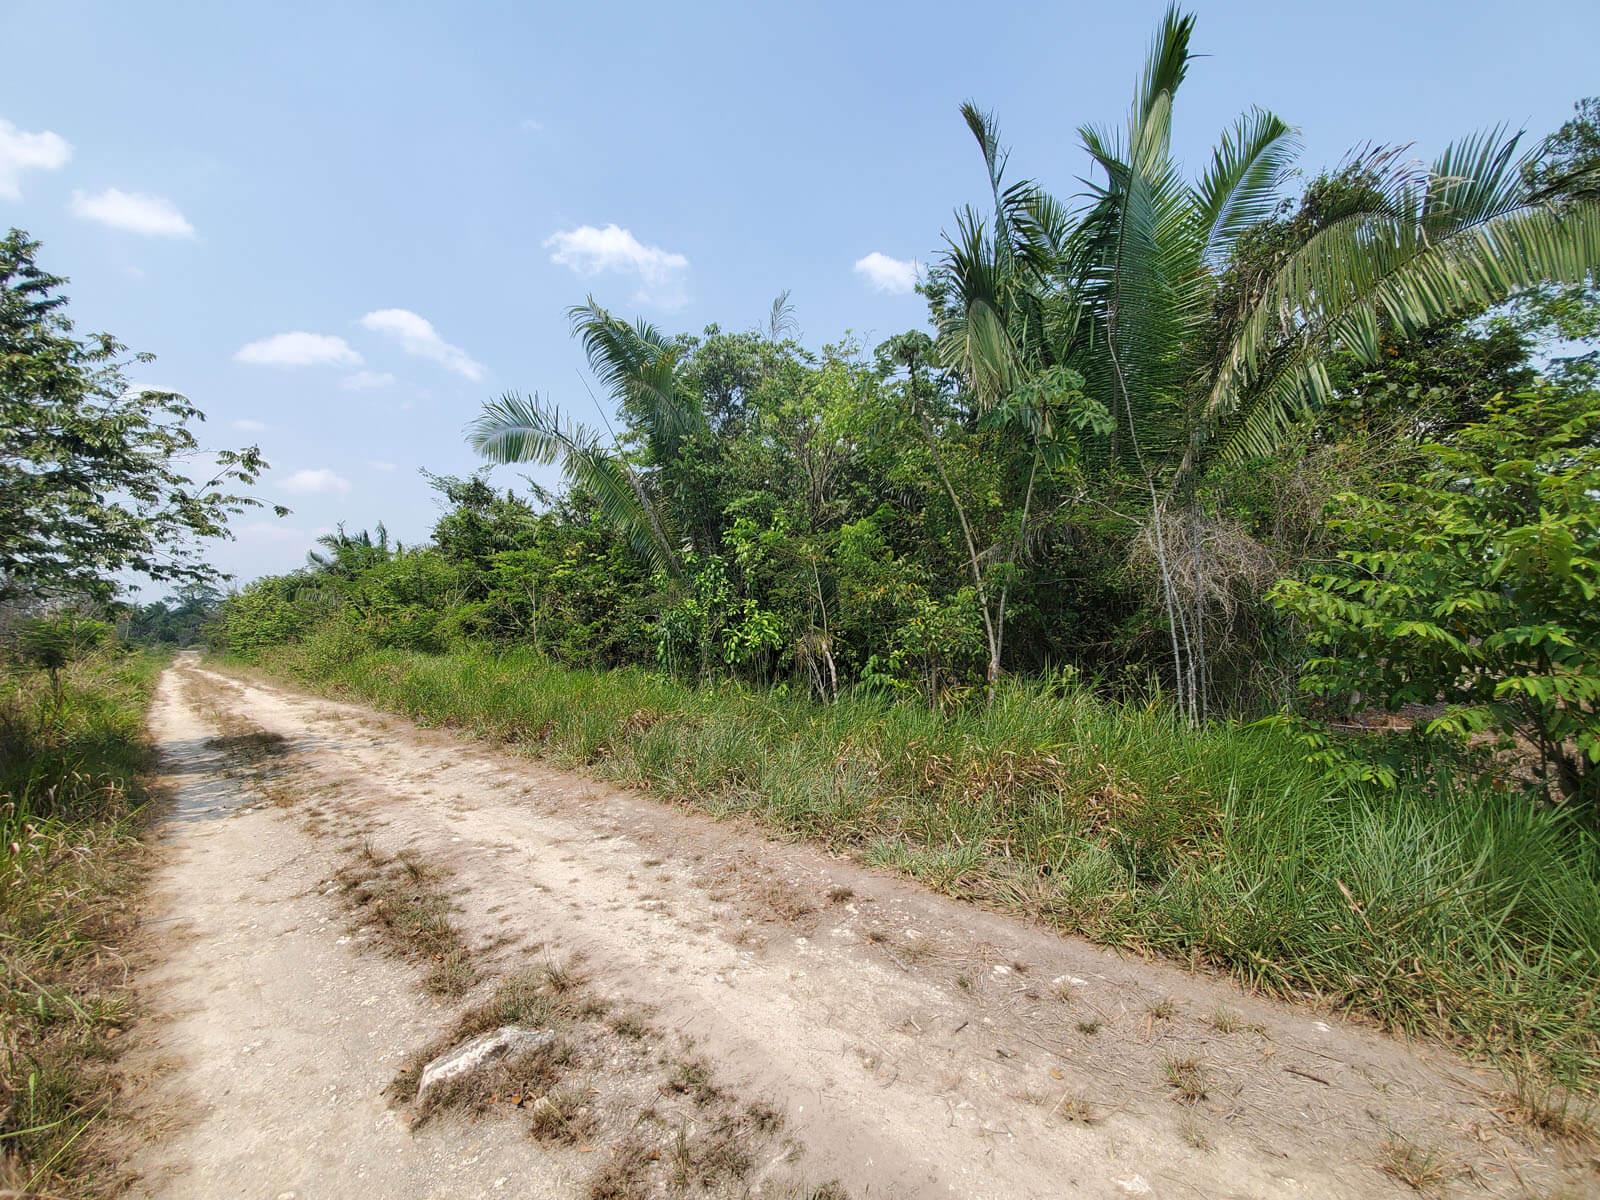 2 Acres of land for sale in Belmopan